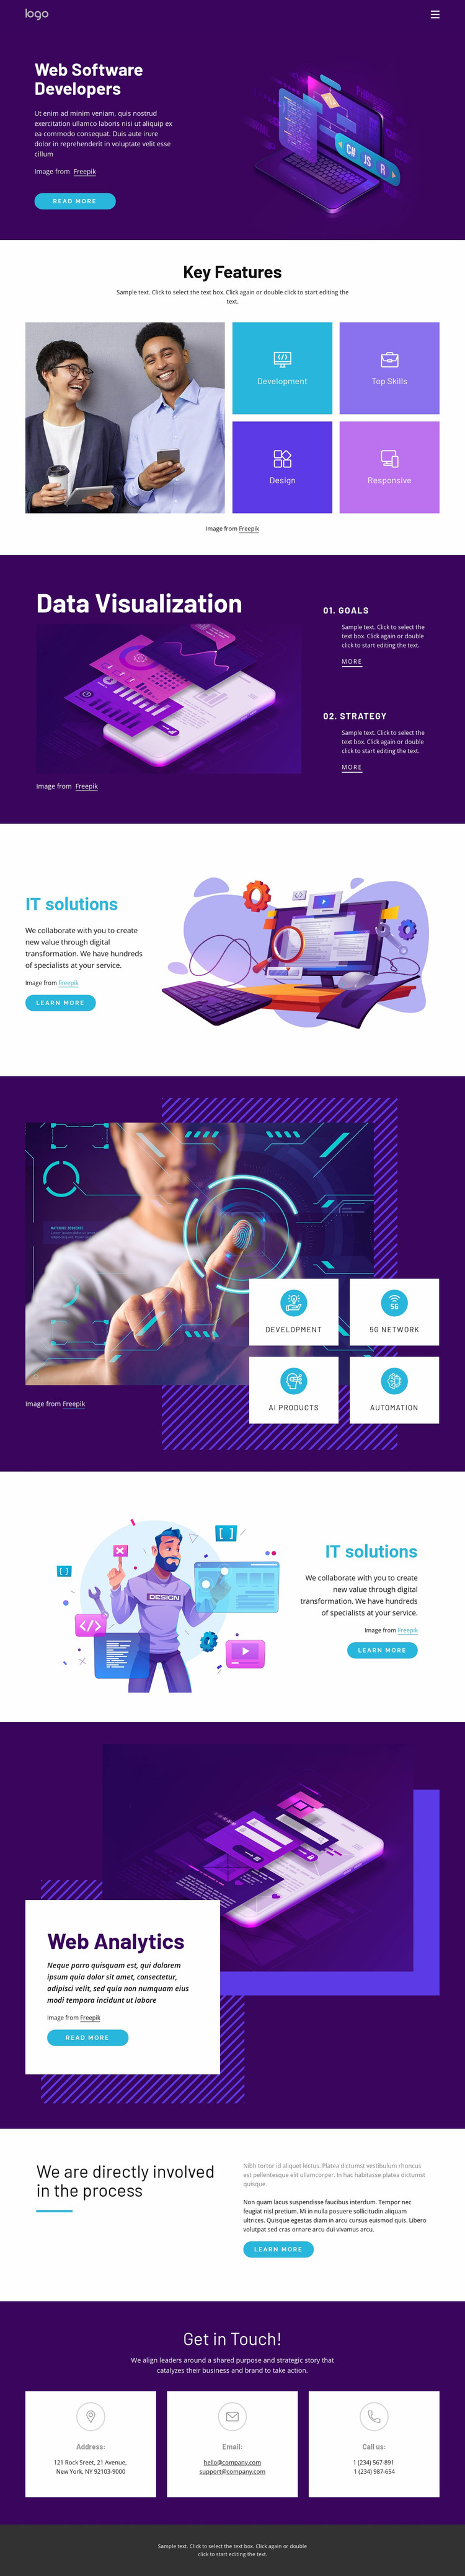 Solutions improve productivity Website Mockup